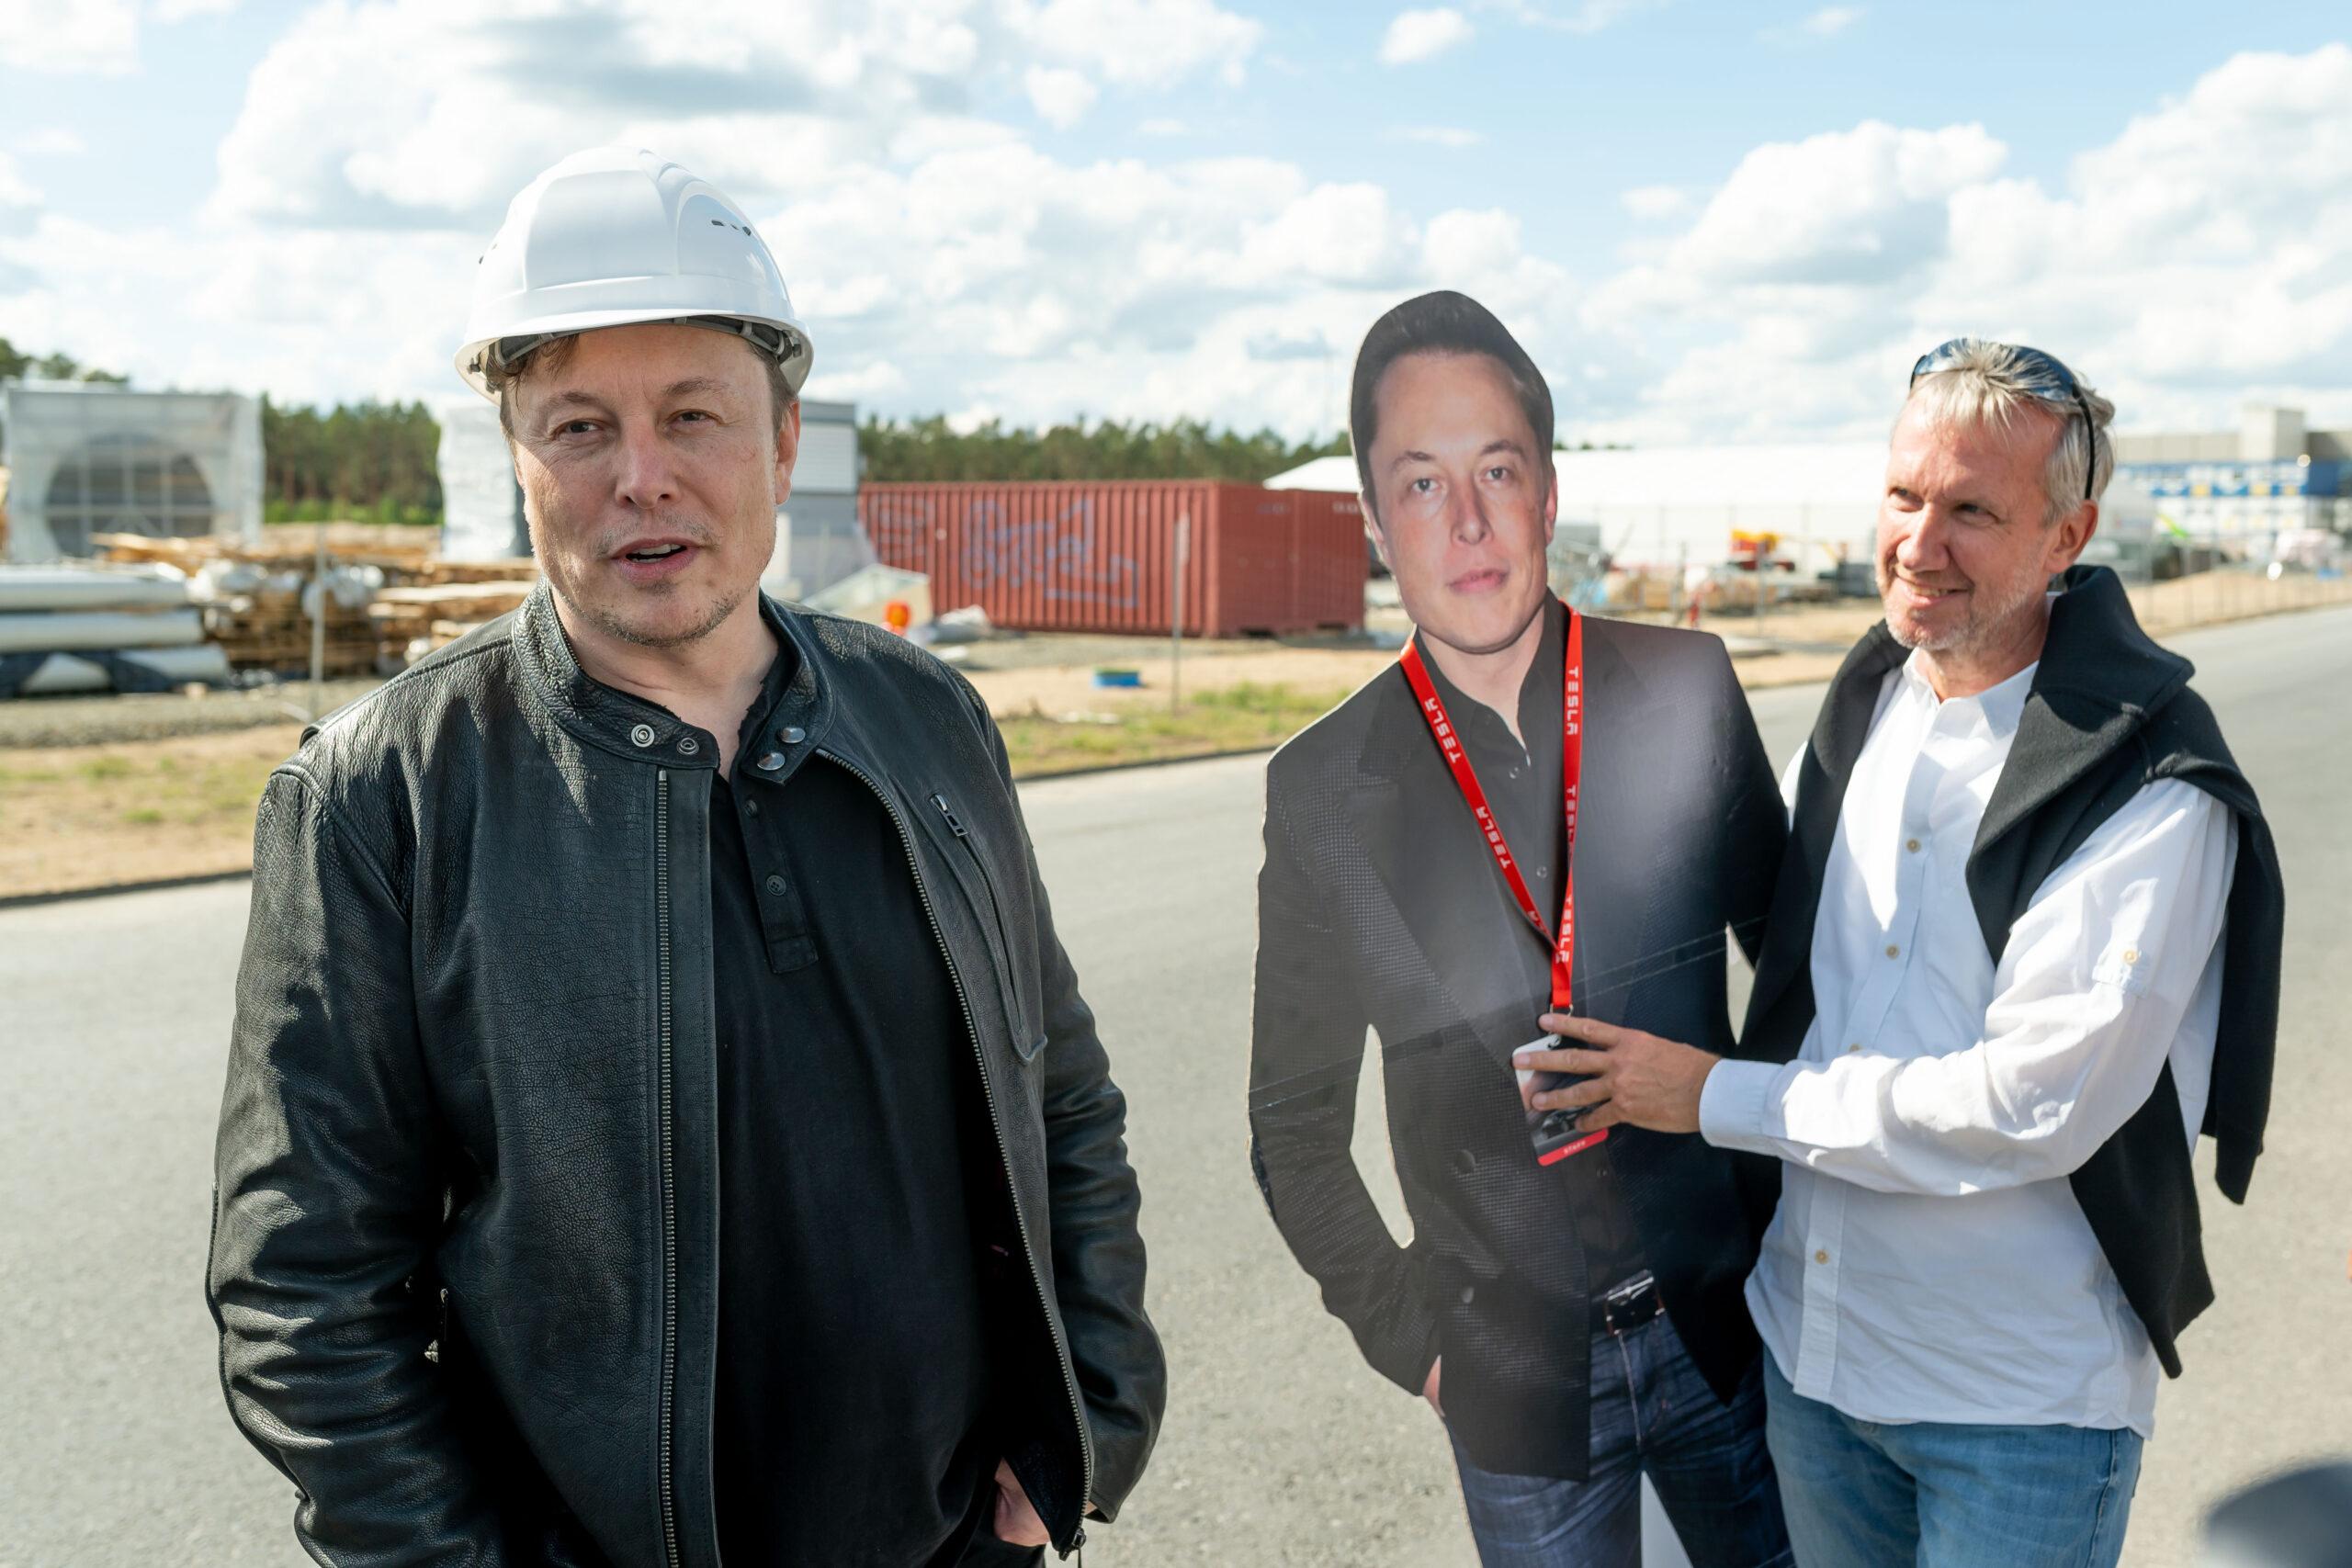 Elon Musk vor der Baustelle GigaFactory Grünheide